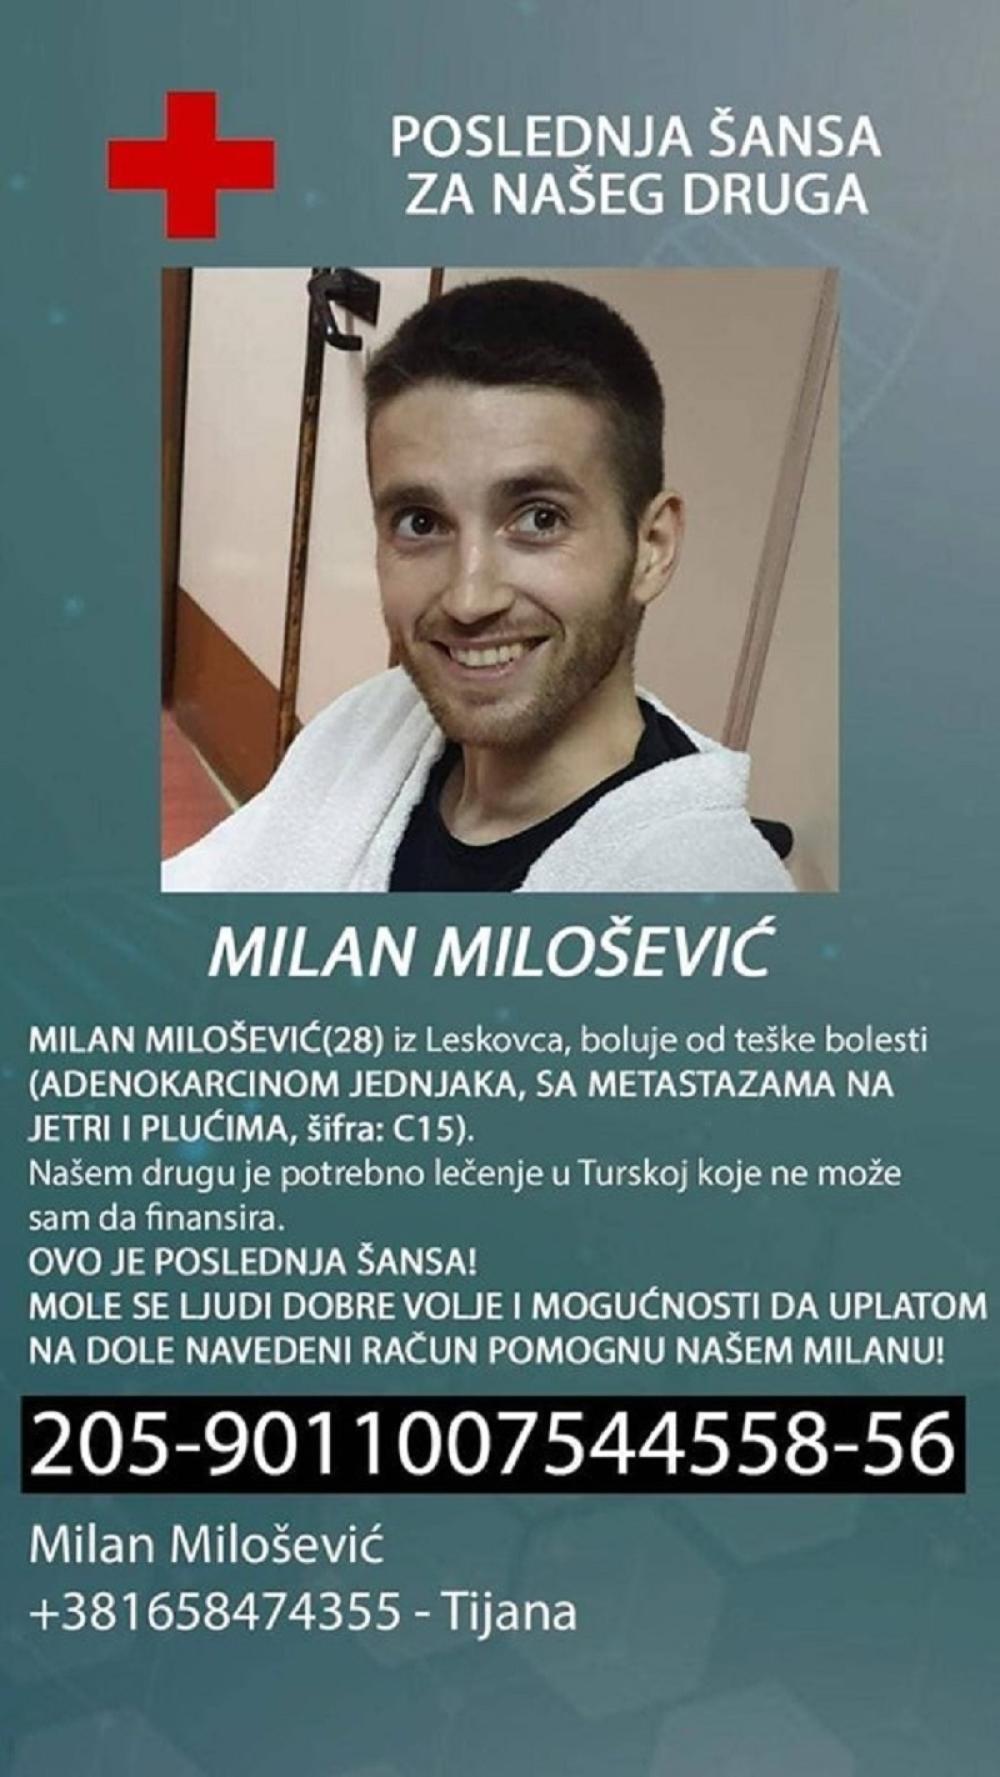 https://www.espreso.rs/data/images/2019/05/13/14/562257_milan-milosevic_ff.jpg?ver=1557752383